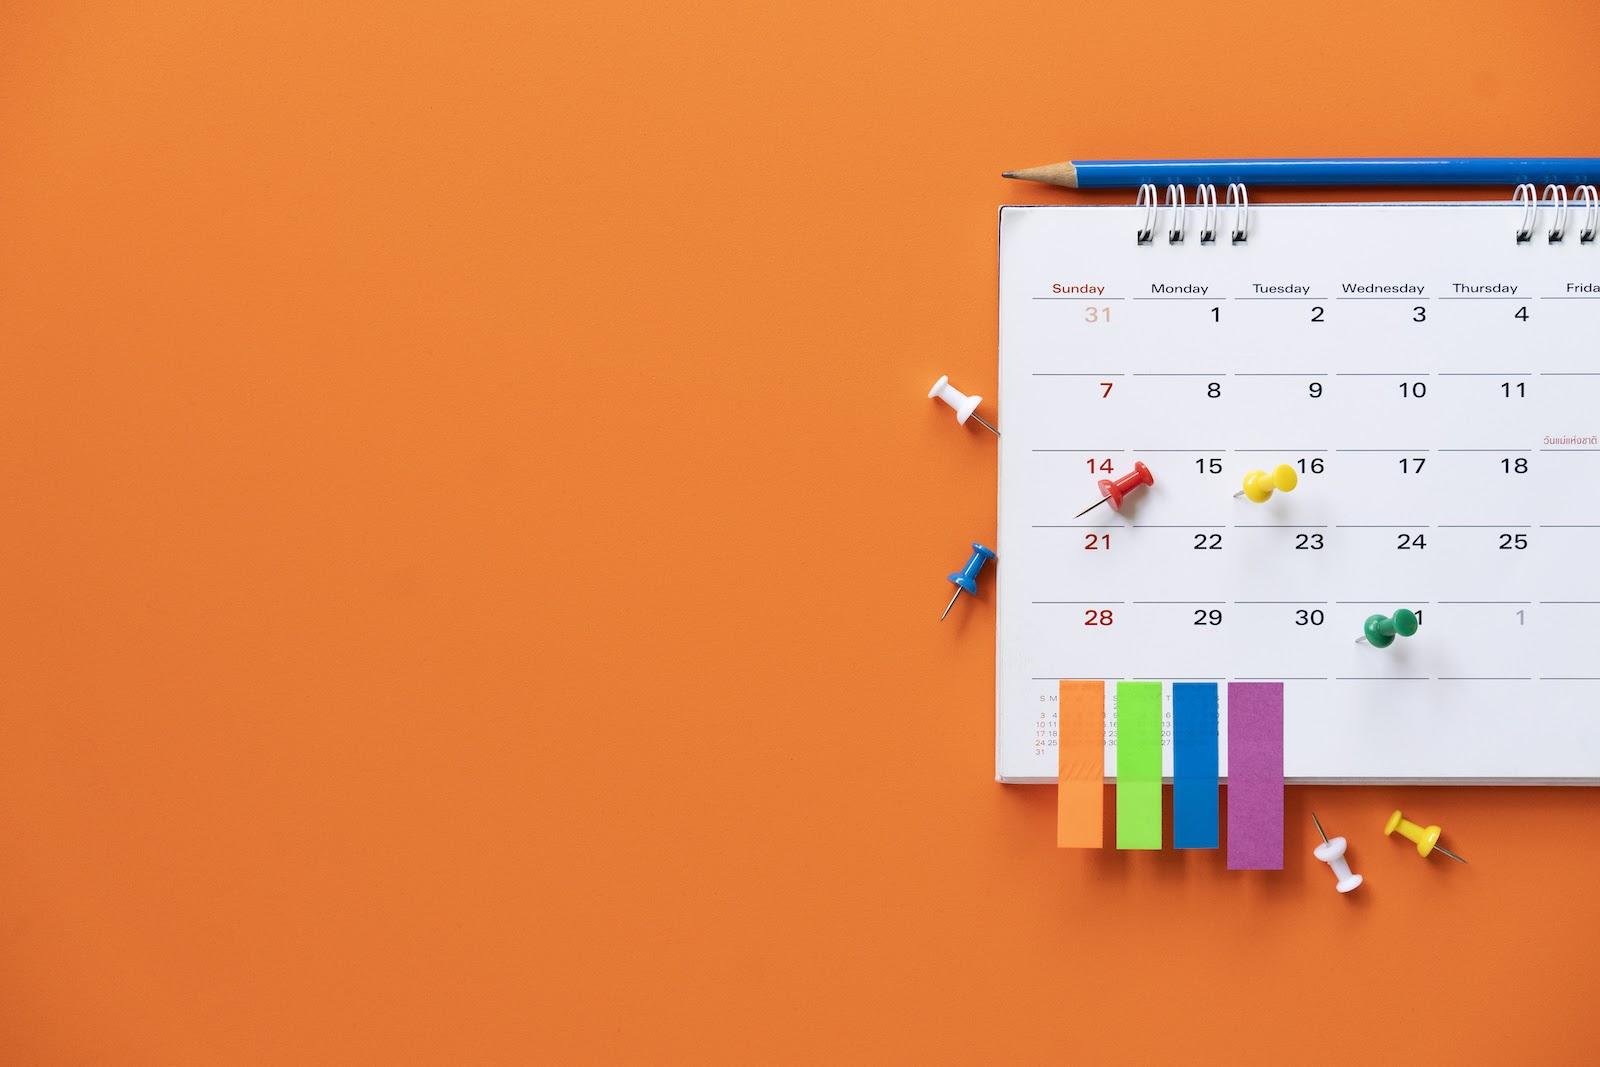 A calendar for planning a schedule